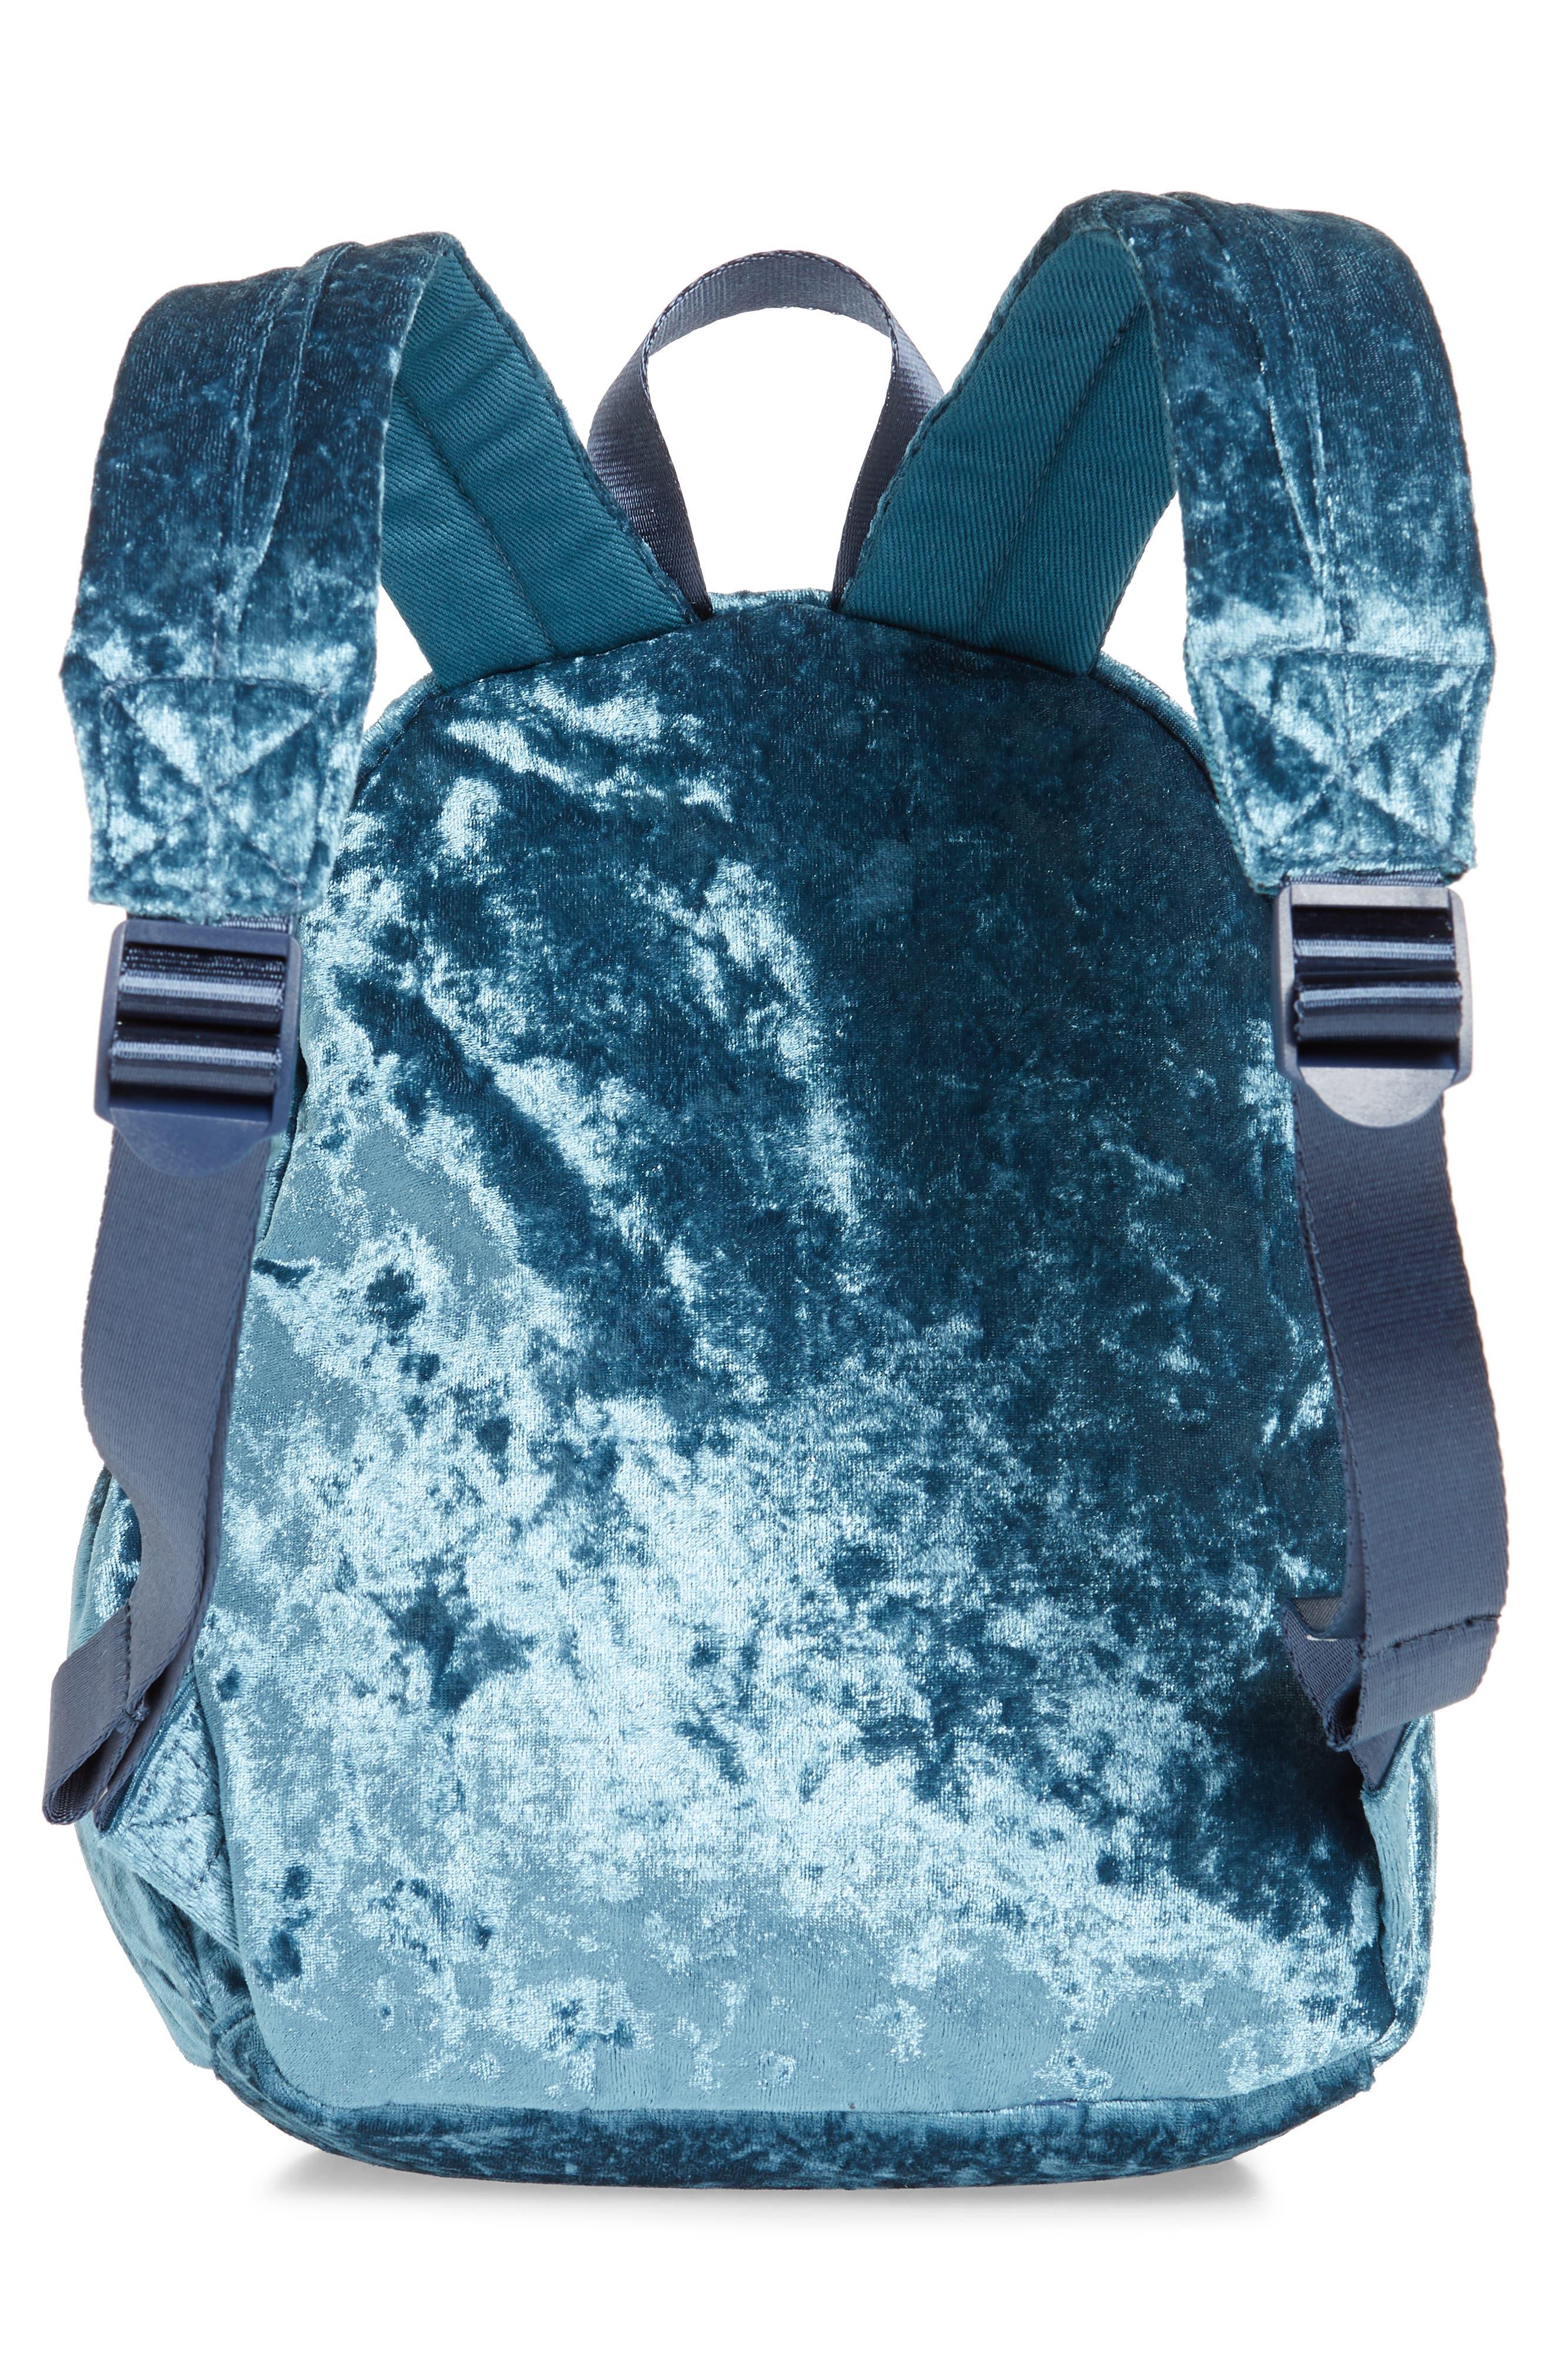 Crushed Velvet Backpack,                             Alternate thumbnail 2, color,                             Brilliant Turquoise